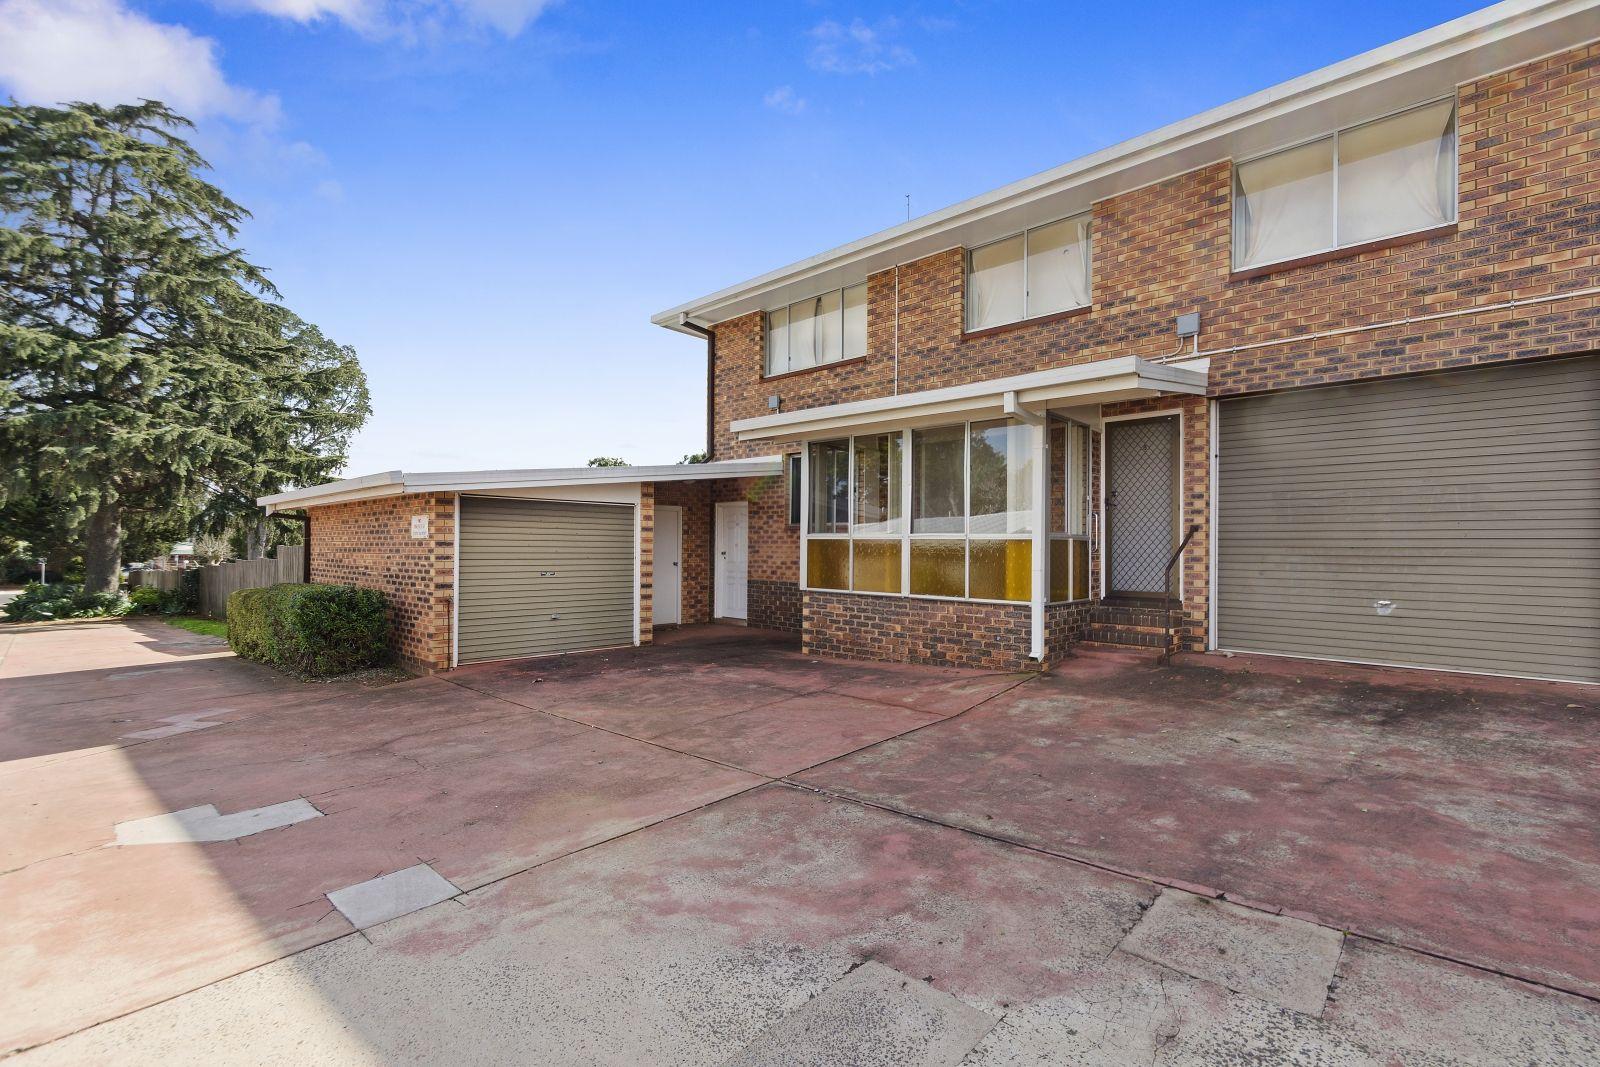 8/24 Lindsay St, East Toowoomba QLD 4350, Image 0